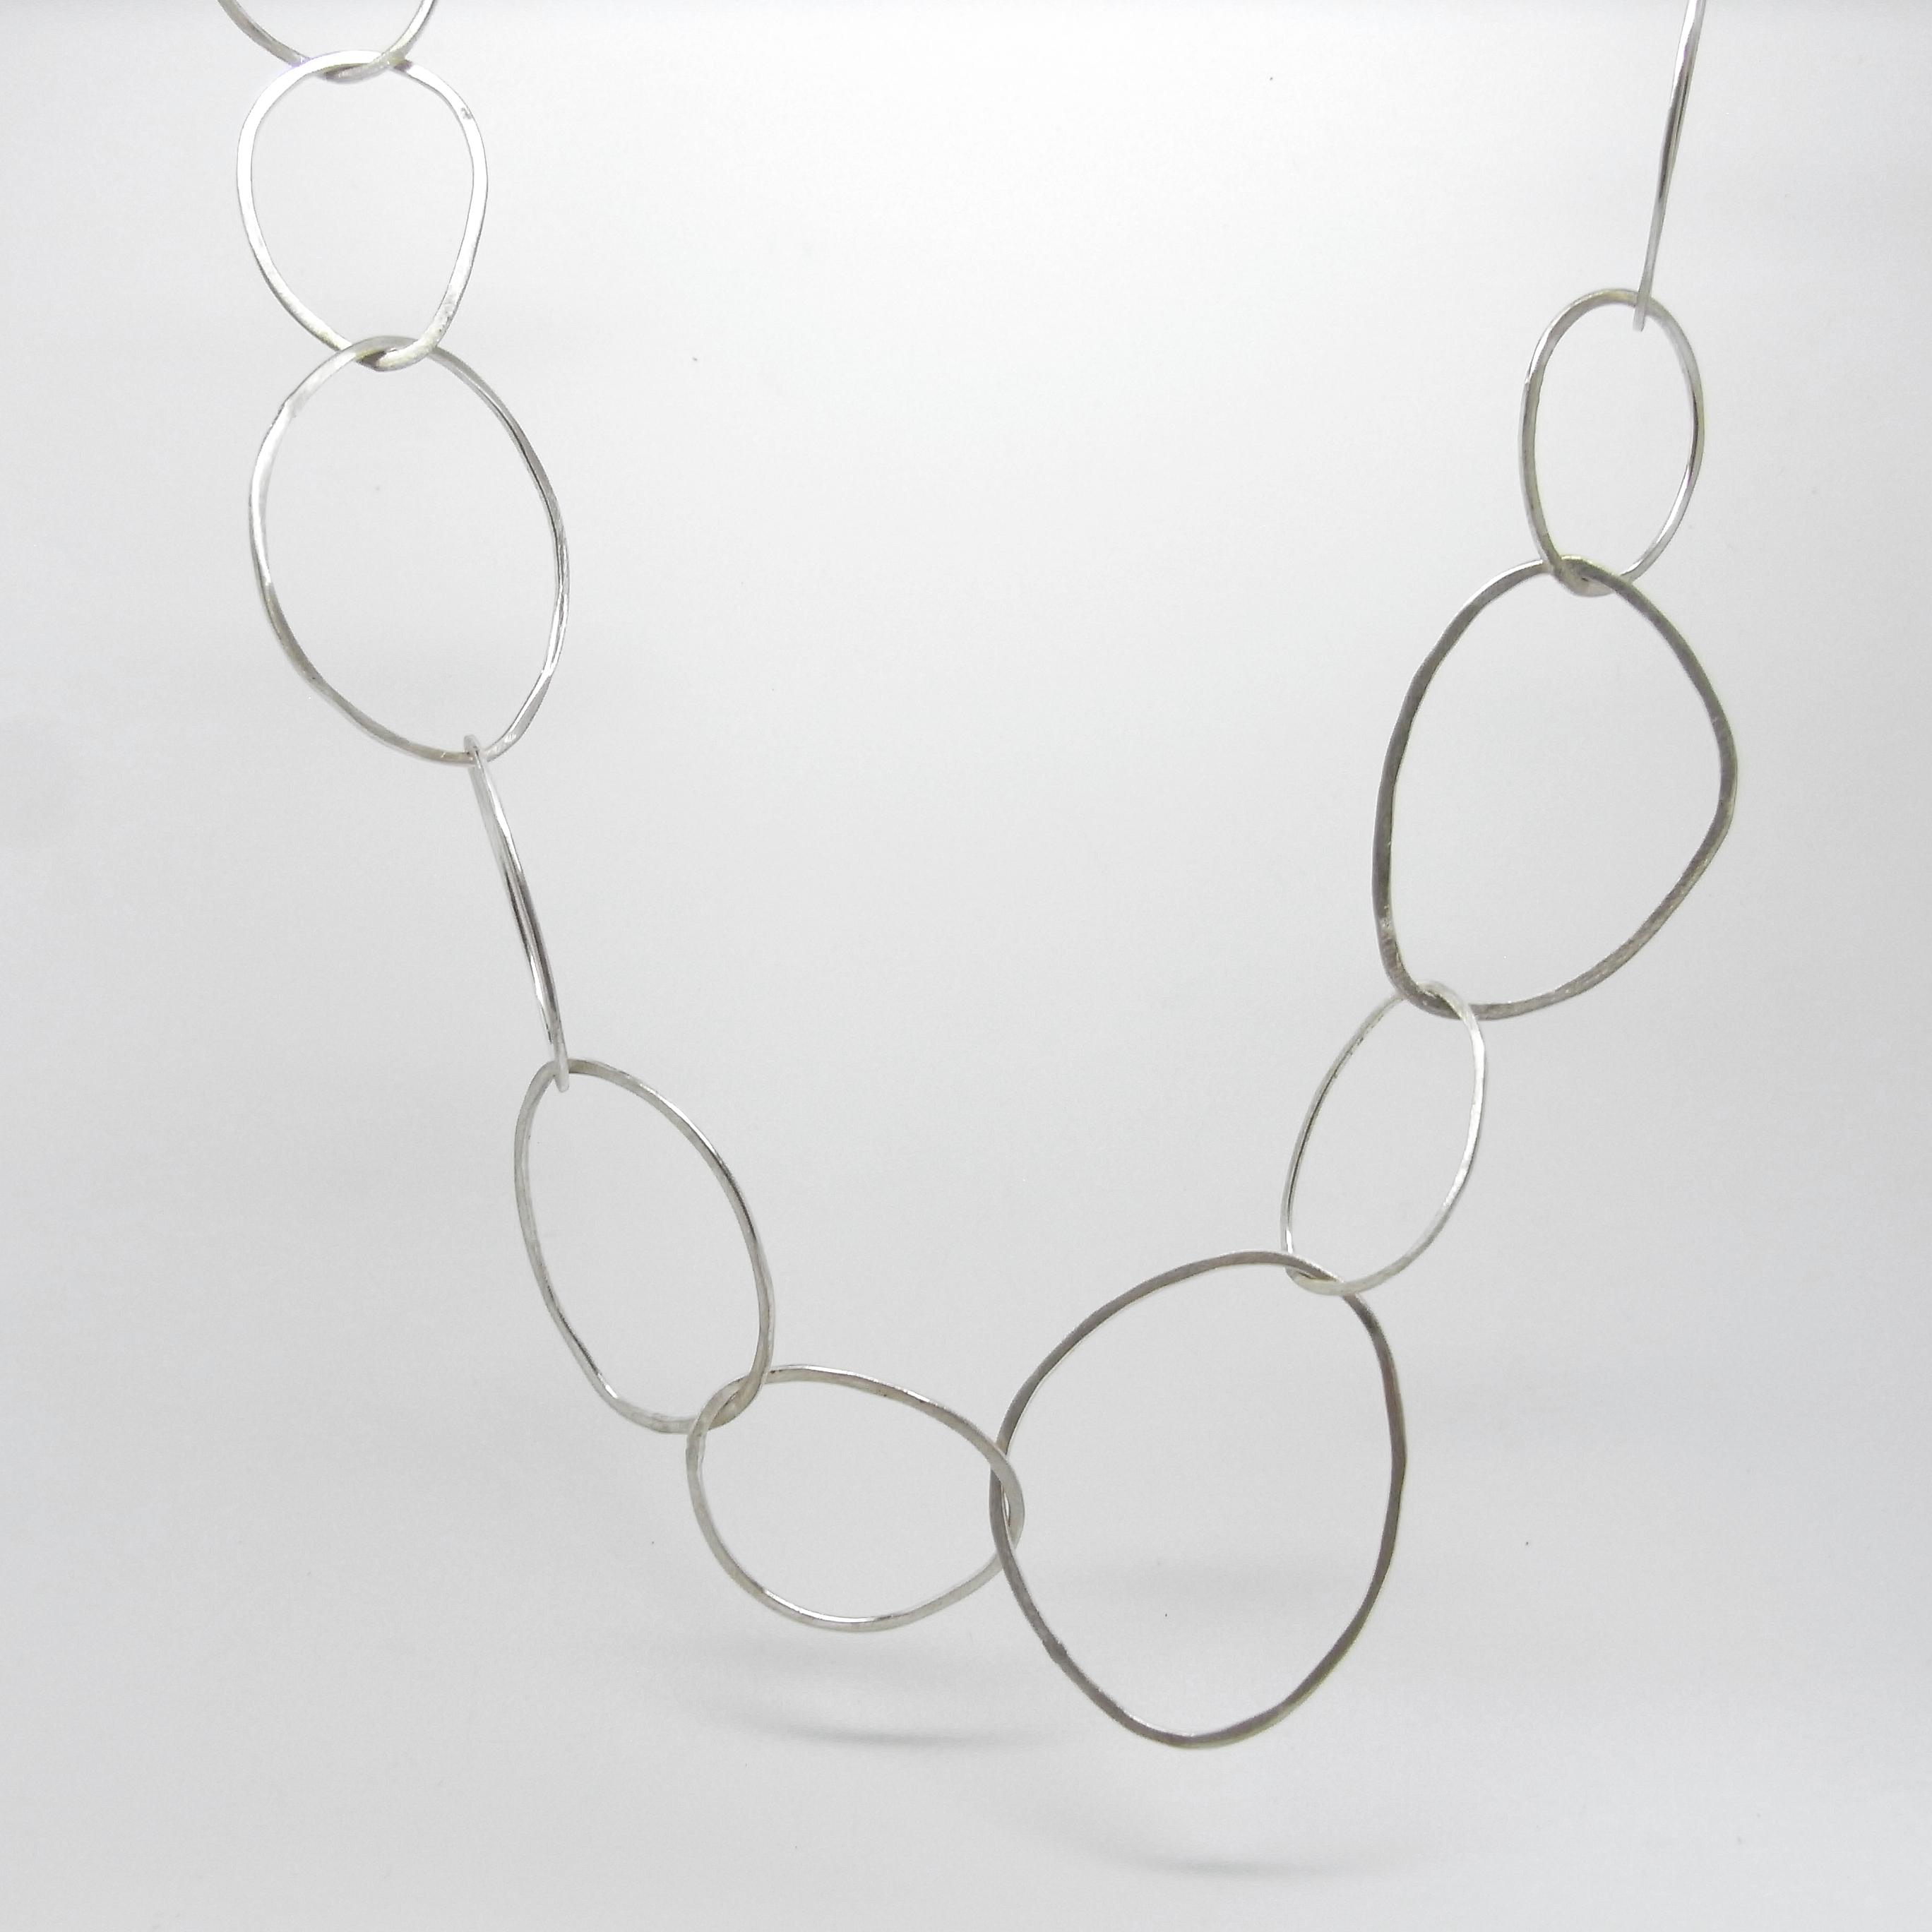 Pebble Chain Necklace